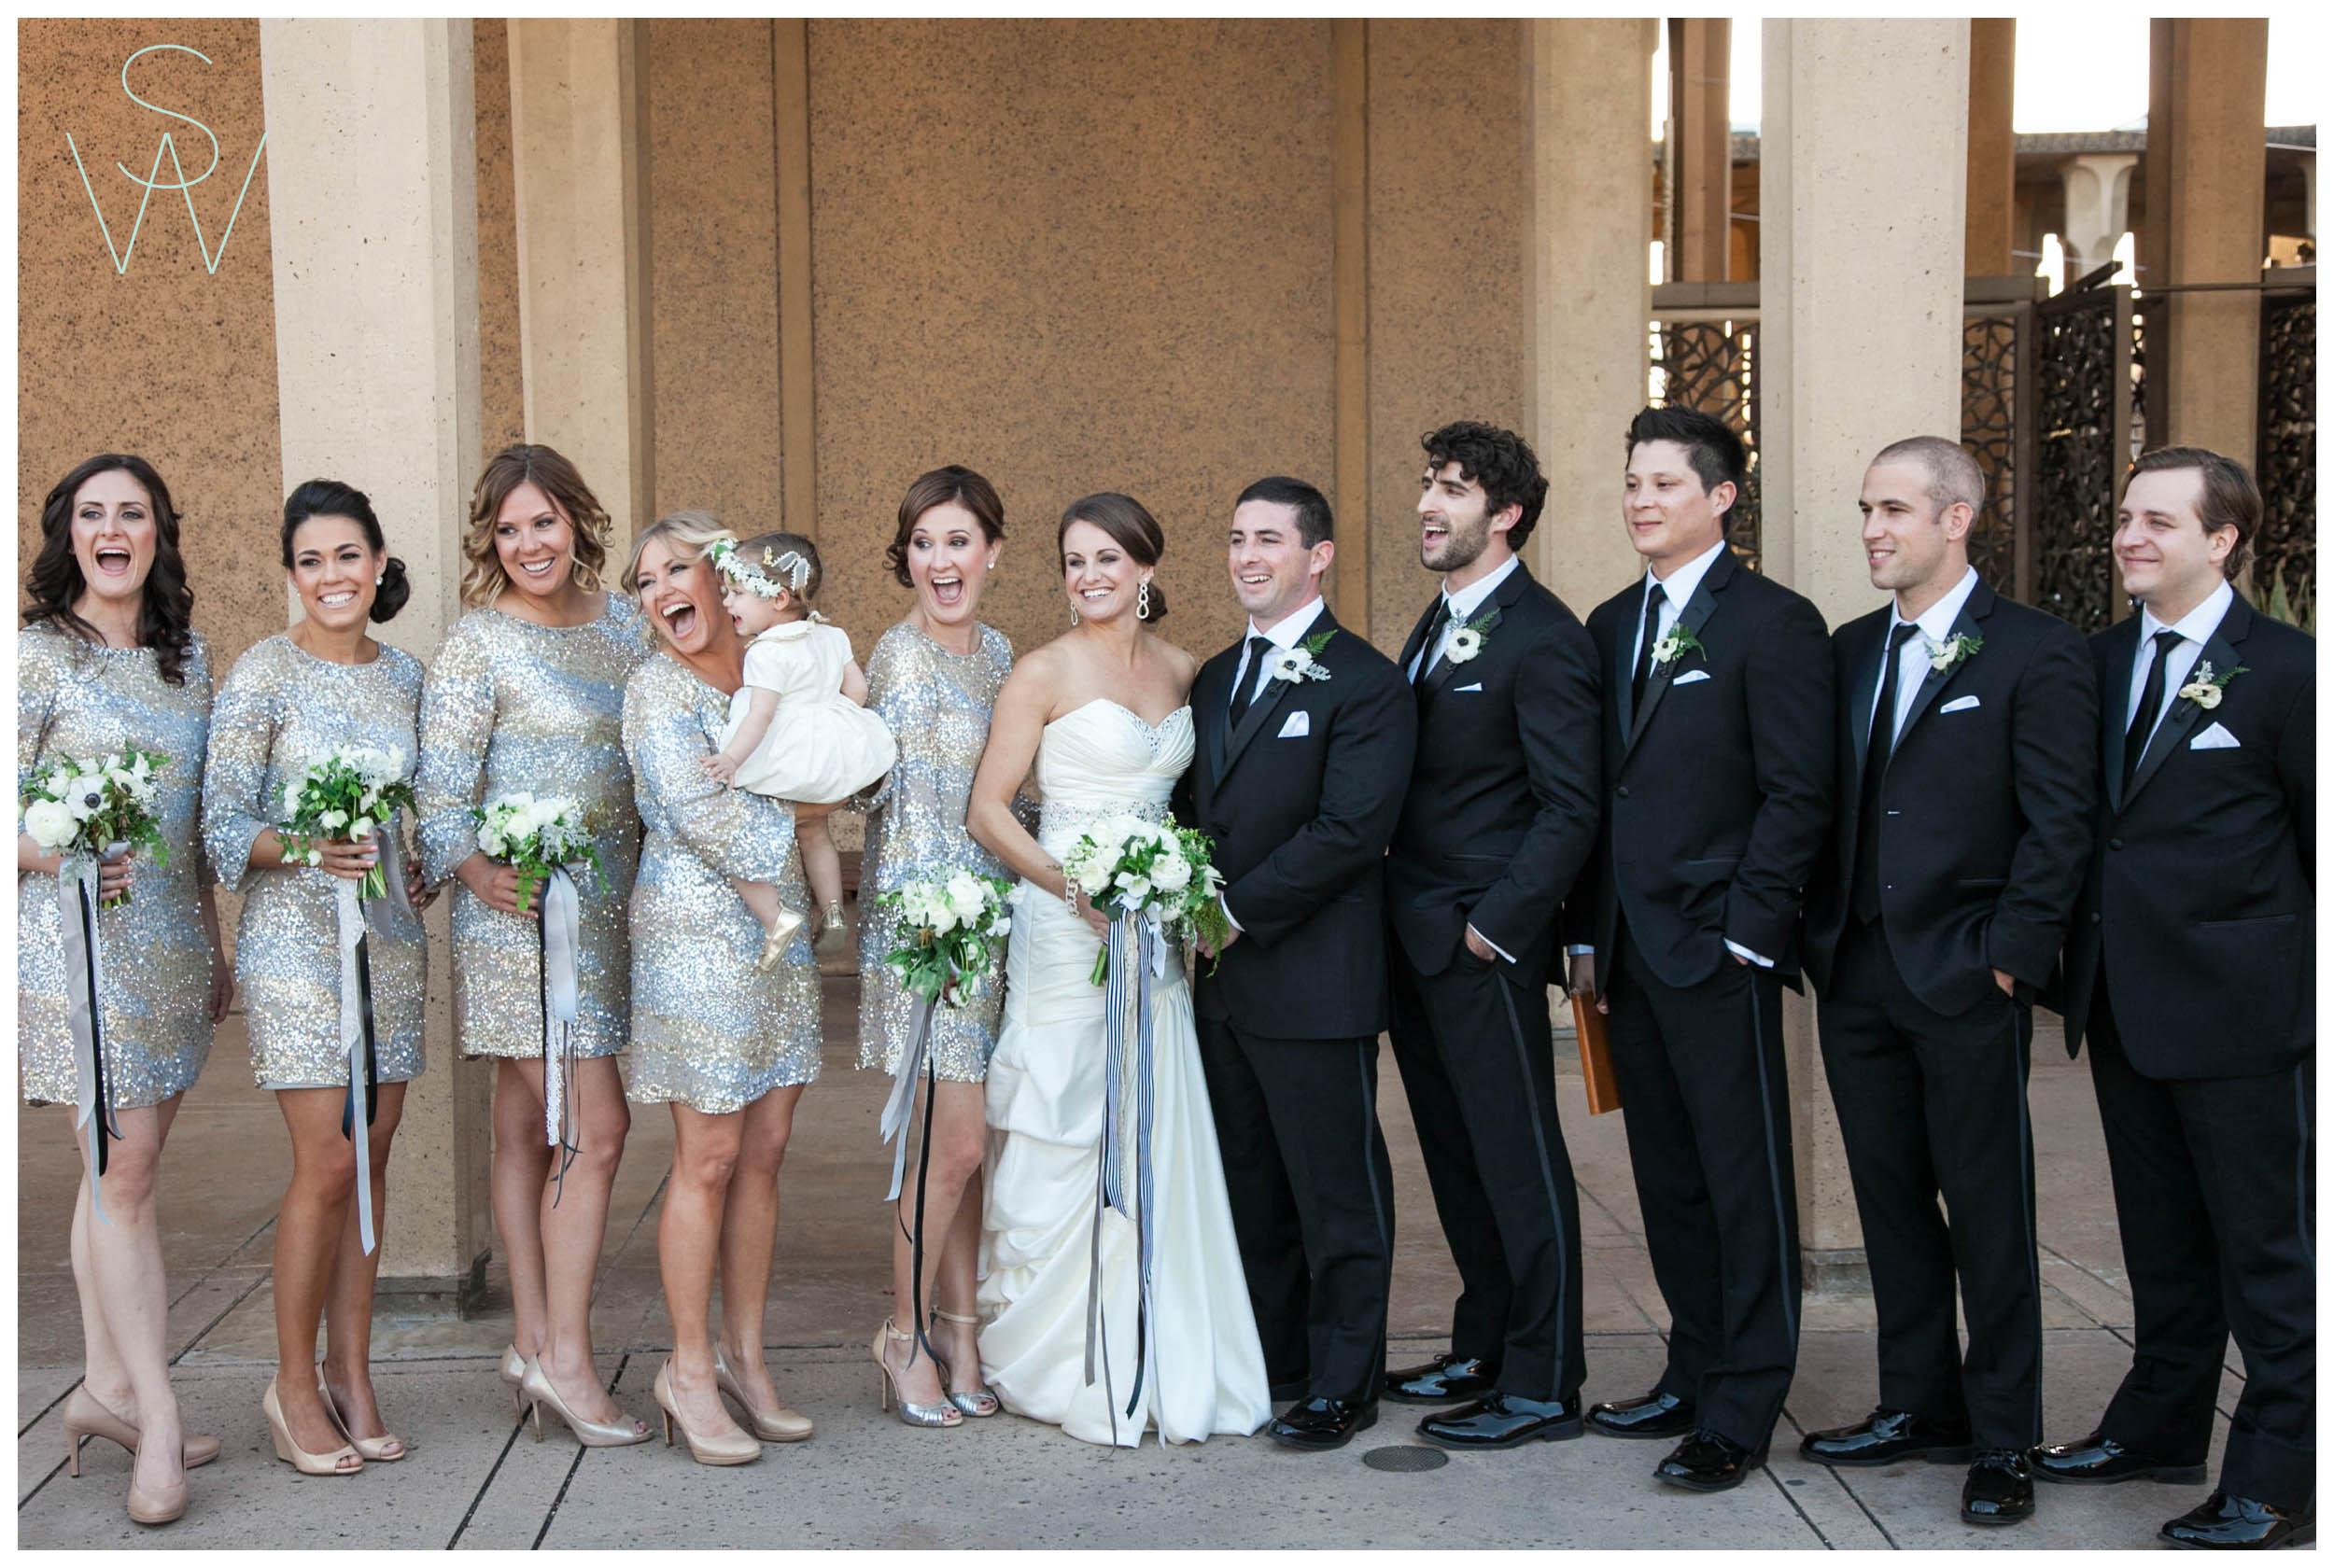 Shewanders.sdma_.wedding.photography-1032.jpg.wedding.photography-1032.jpg